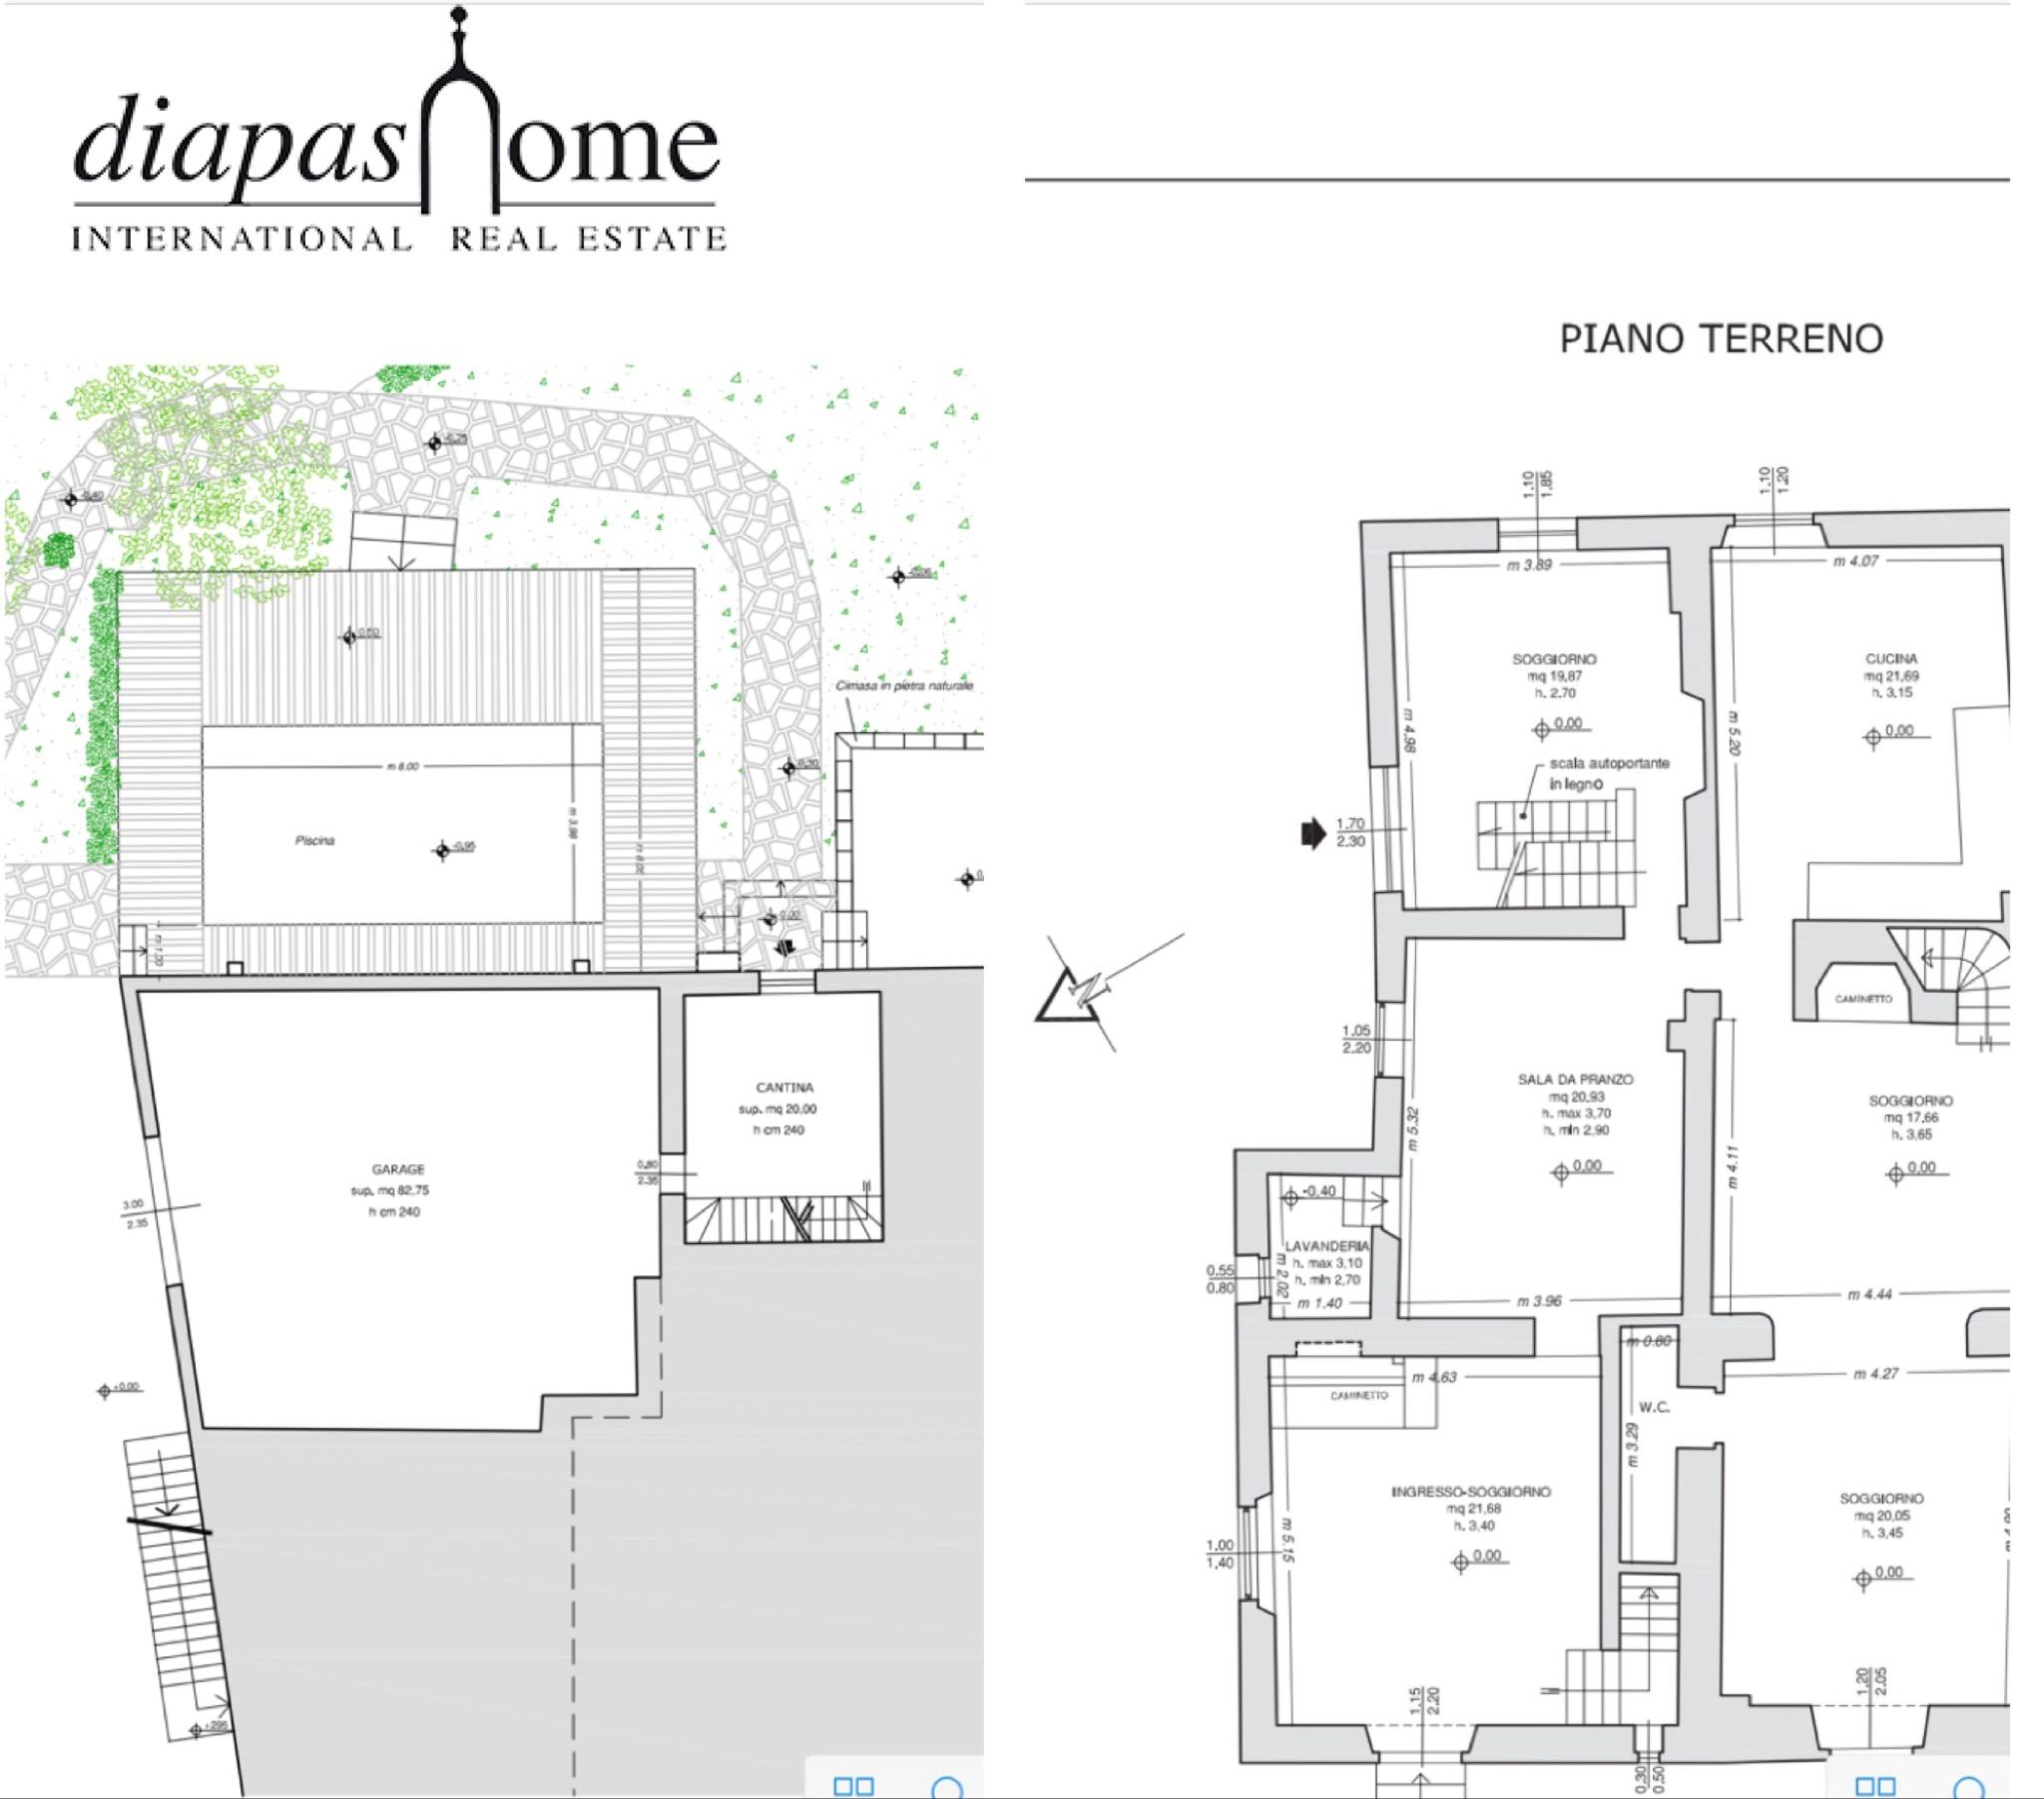 villa, carmignano,diapashome,real,estate_7